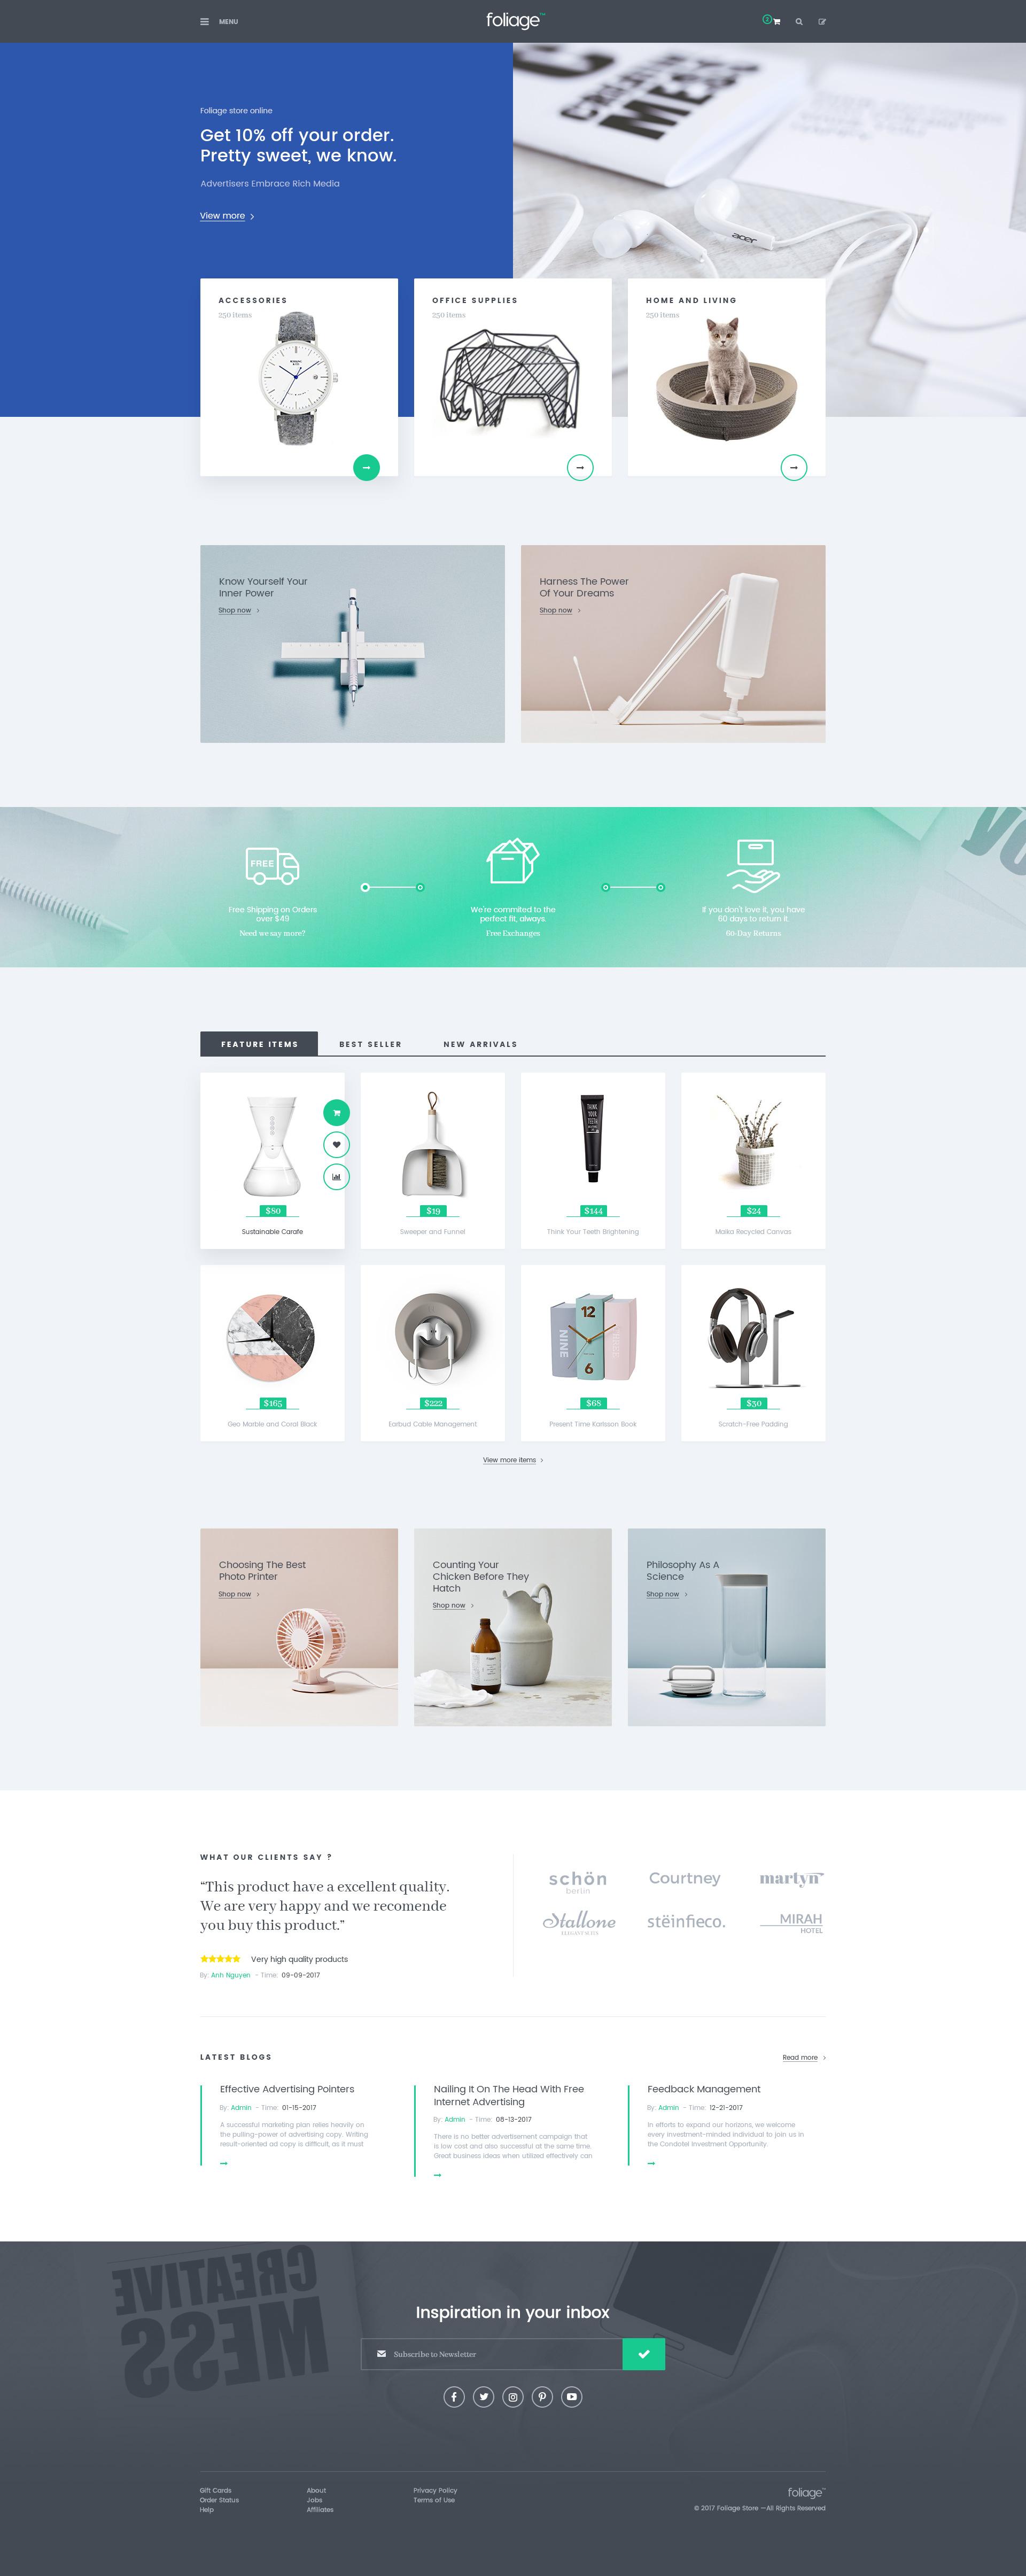 Foliage Multipurpose Woo merce WordPress Theme by themelexus